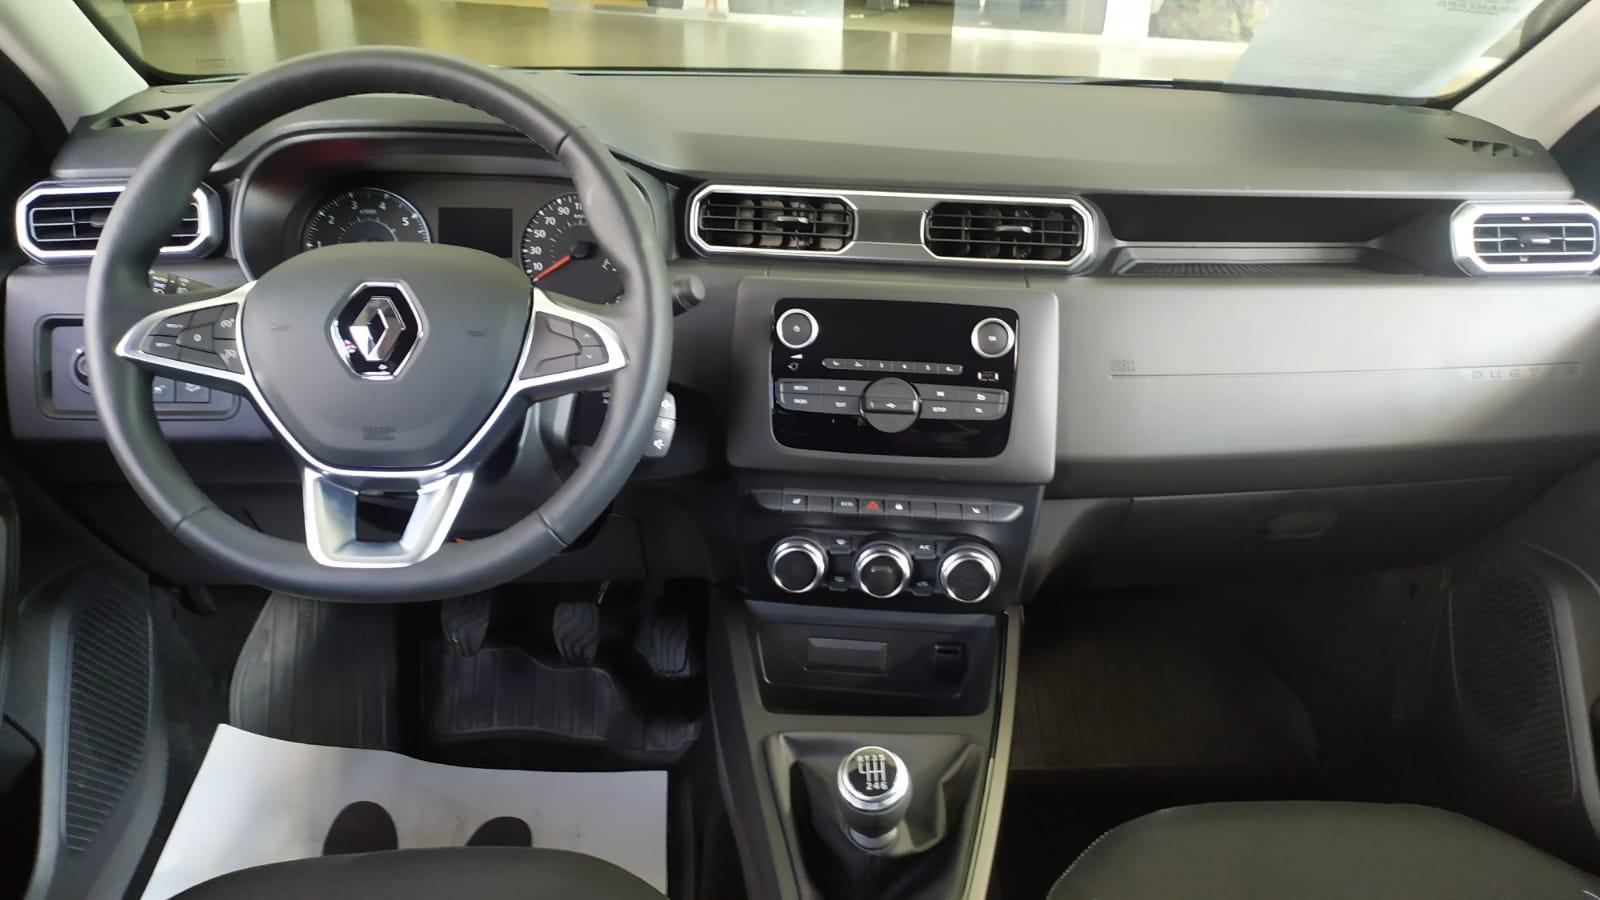 Renault Duster универсал. 1.6 л., 16-кл., (117л.с.) МКП6, 4х4, Drive. Белый 2021